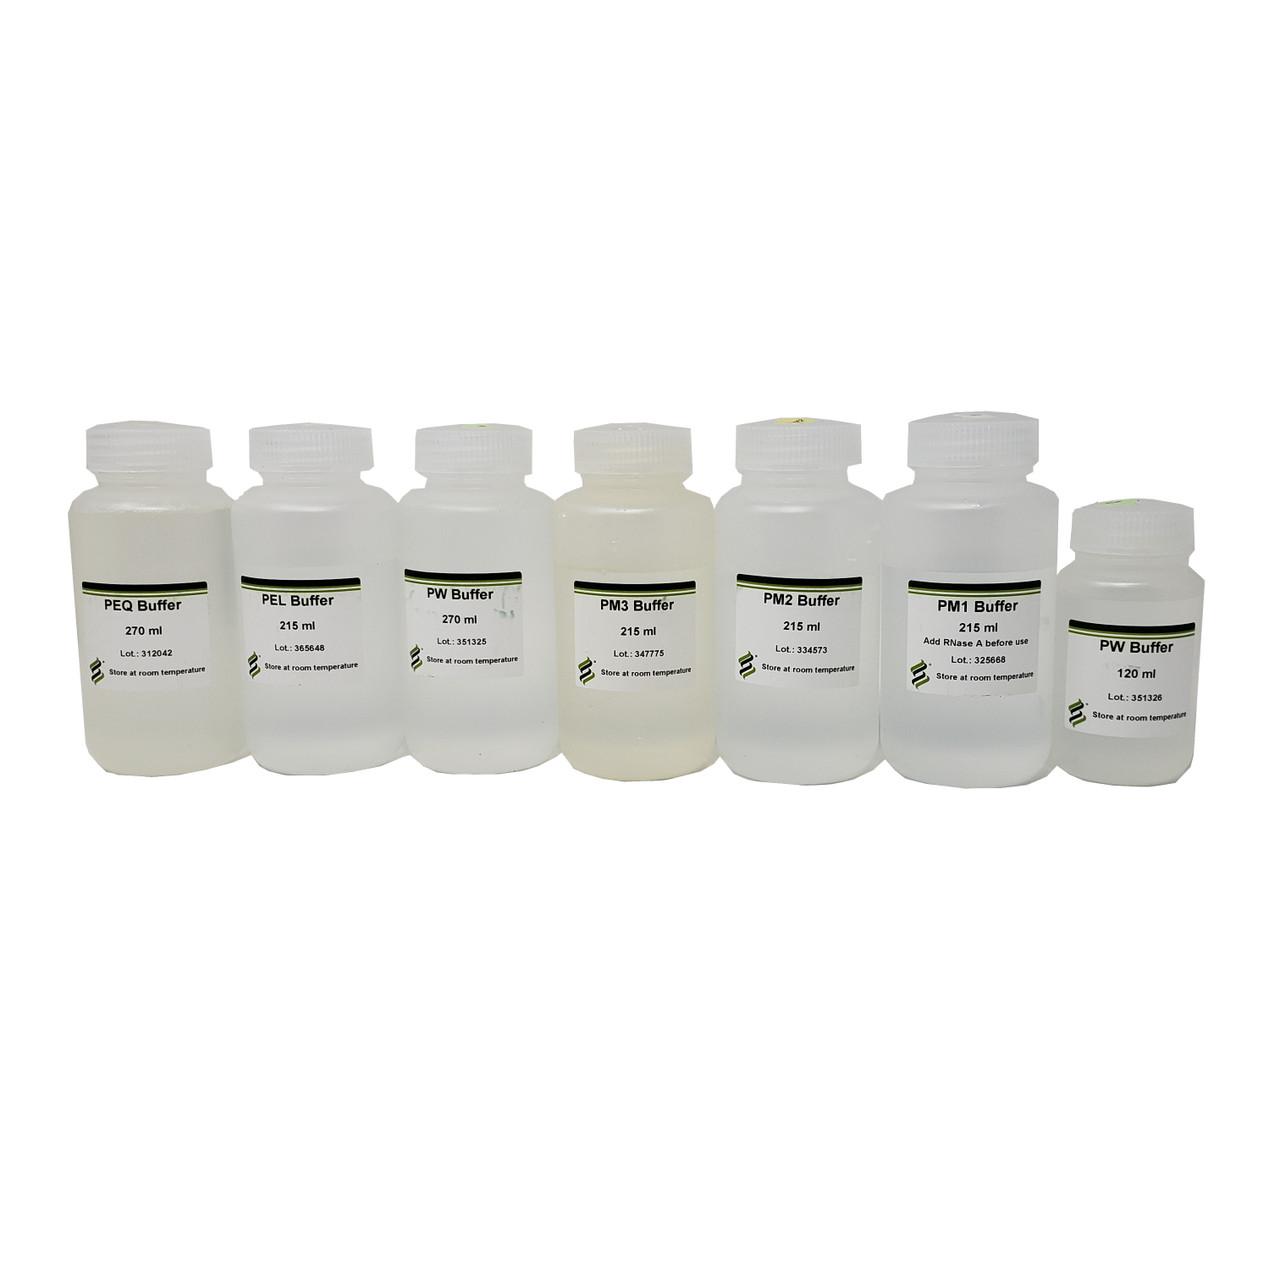 Favorgen Plasmid DNA Extraction Maxi Kit